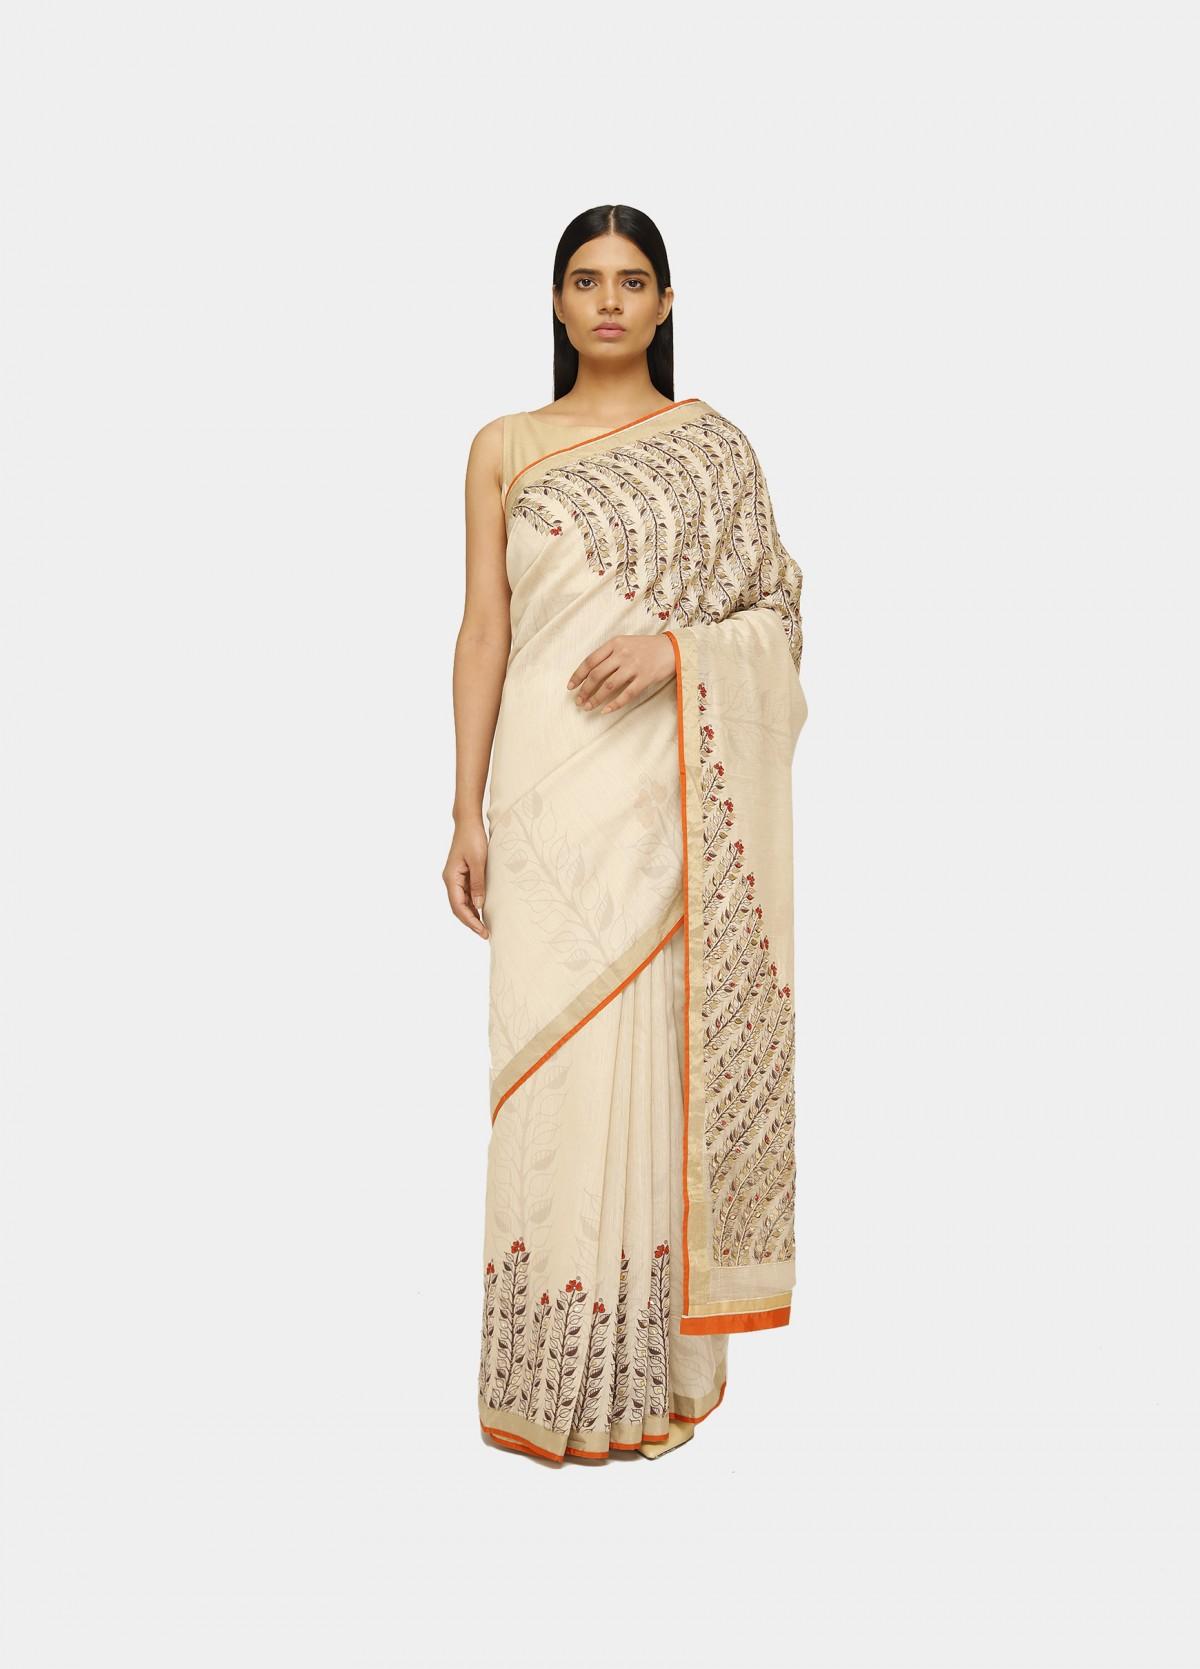 The Varak Sari